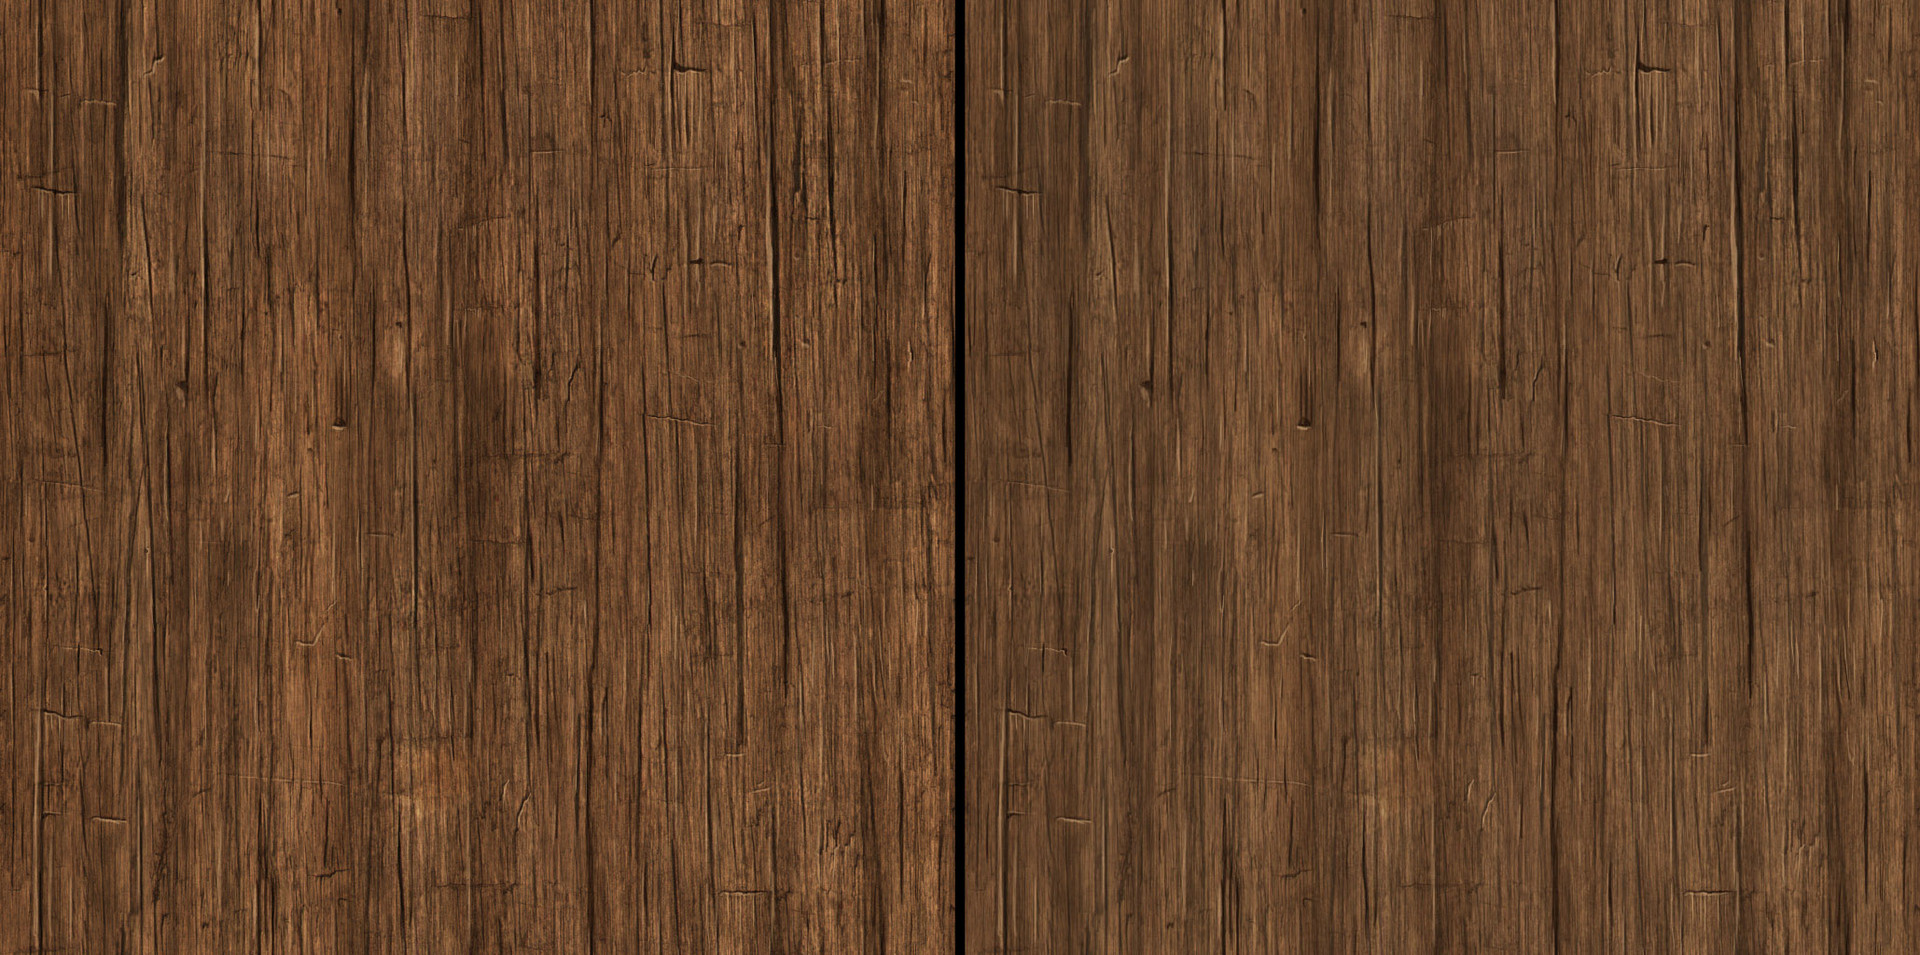 Wood Texture Art